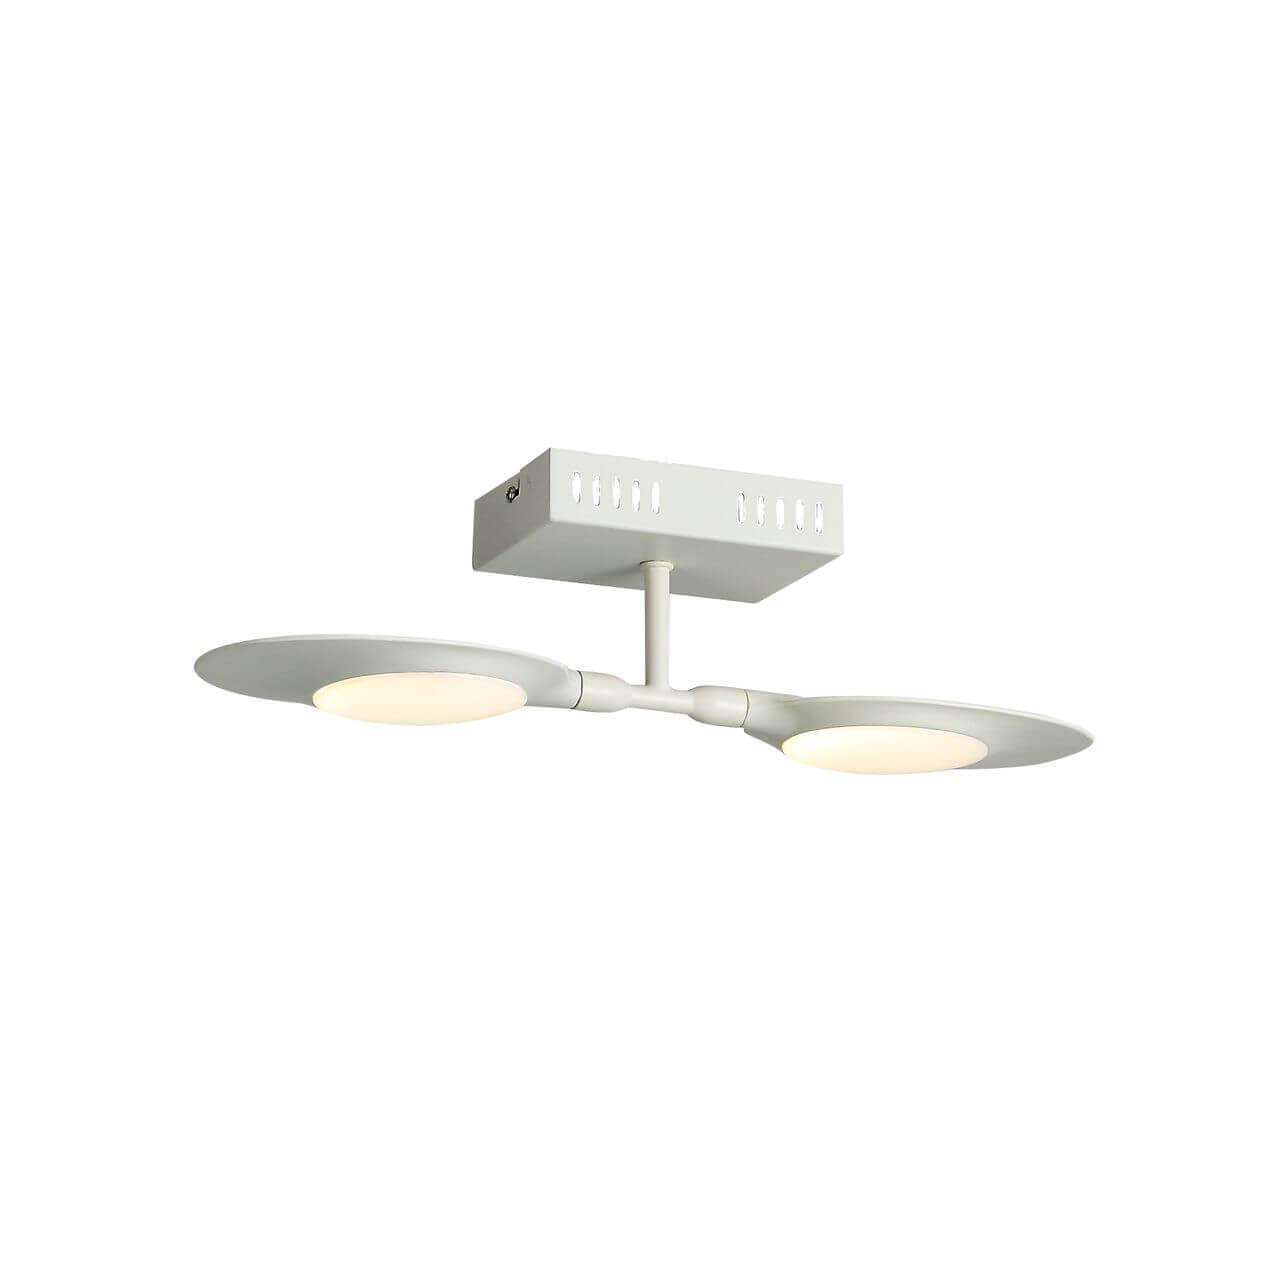 цена на Потолочная светодиодная люстра ST Luce Farfalla SL824.501.02